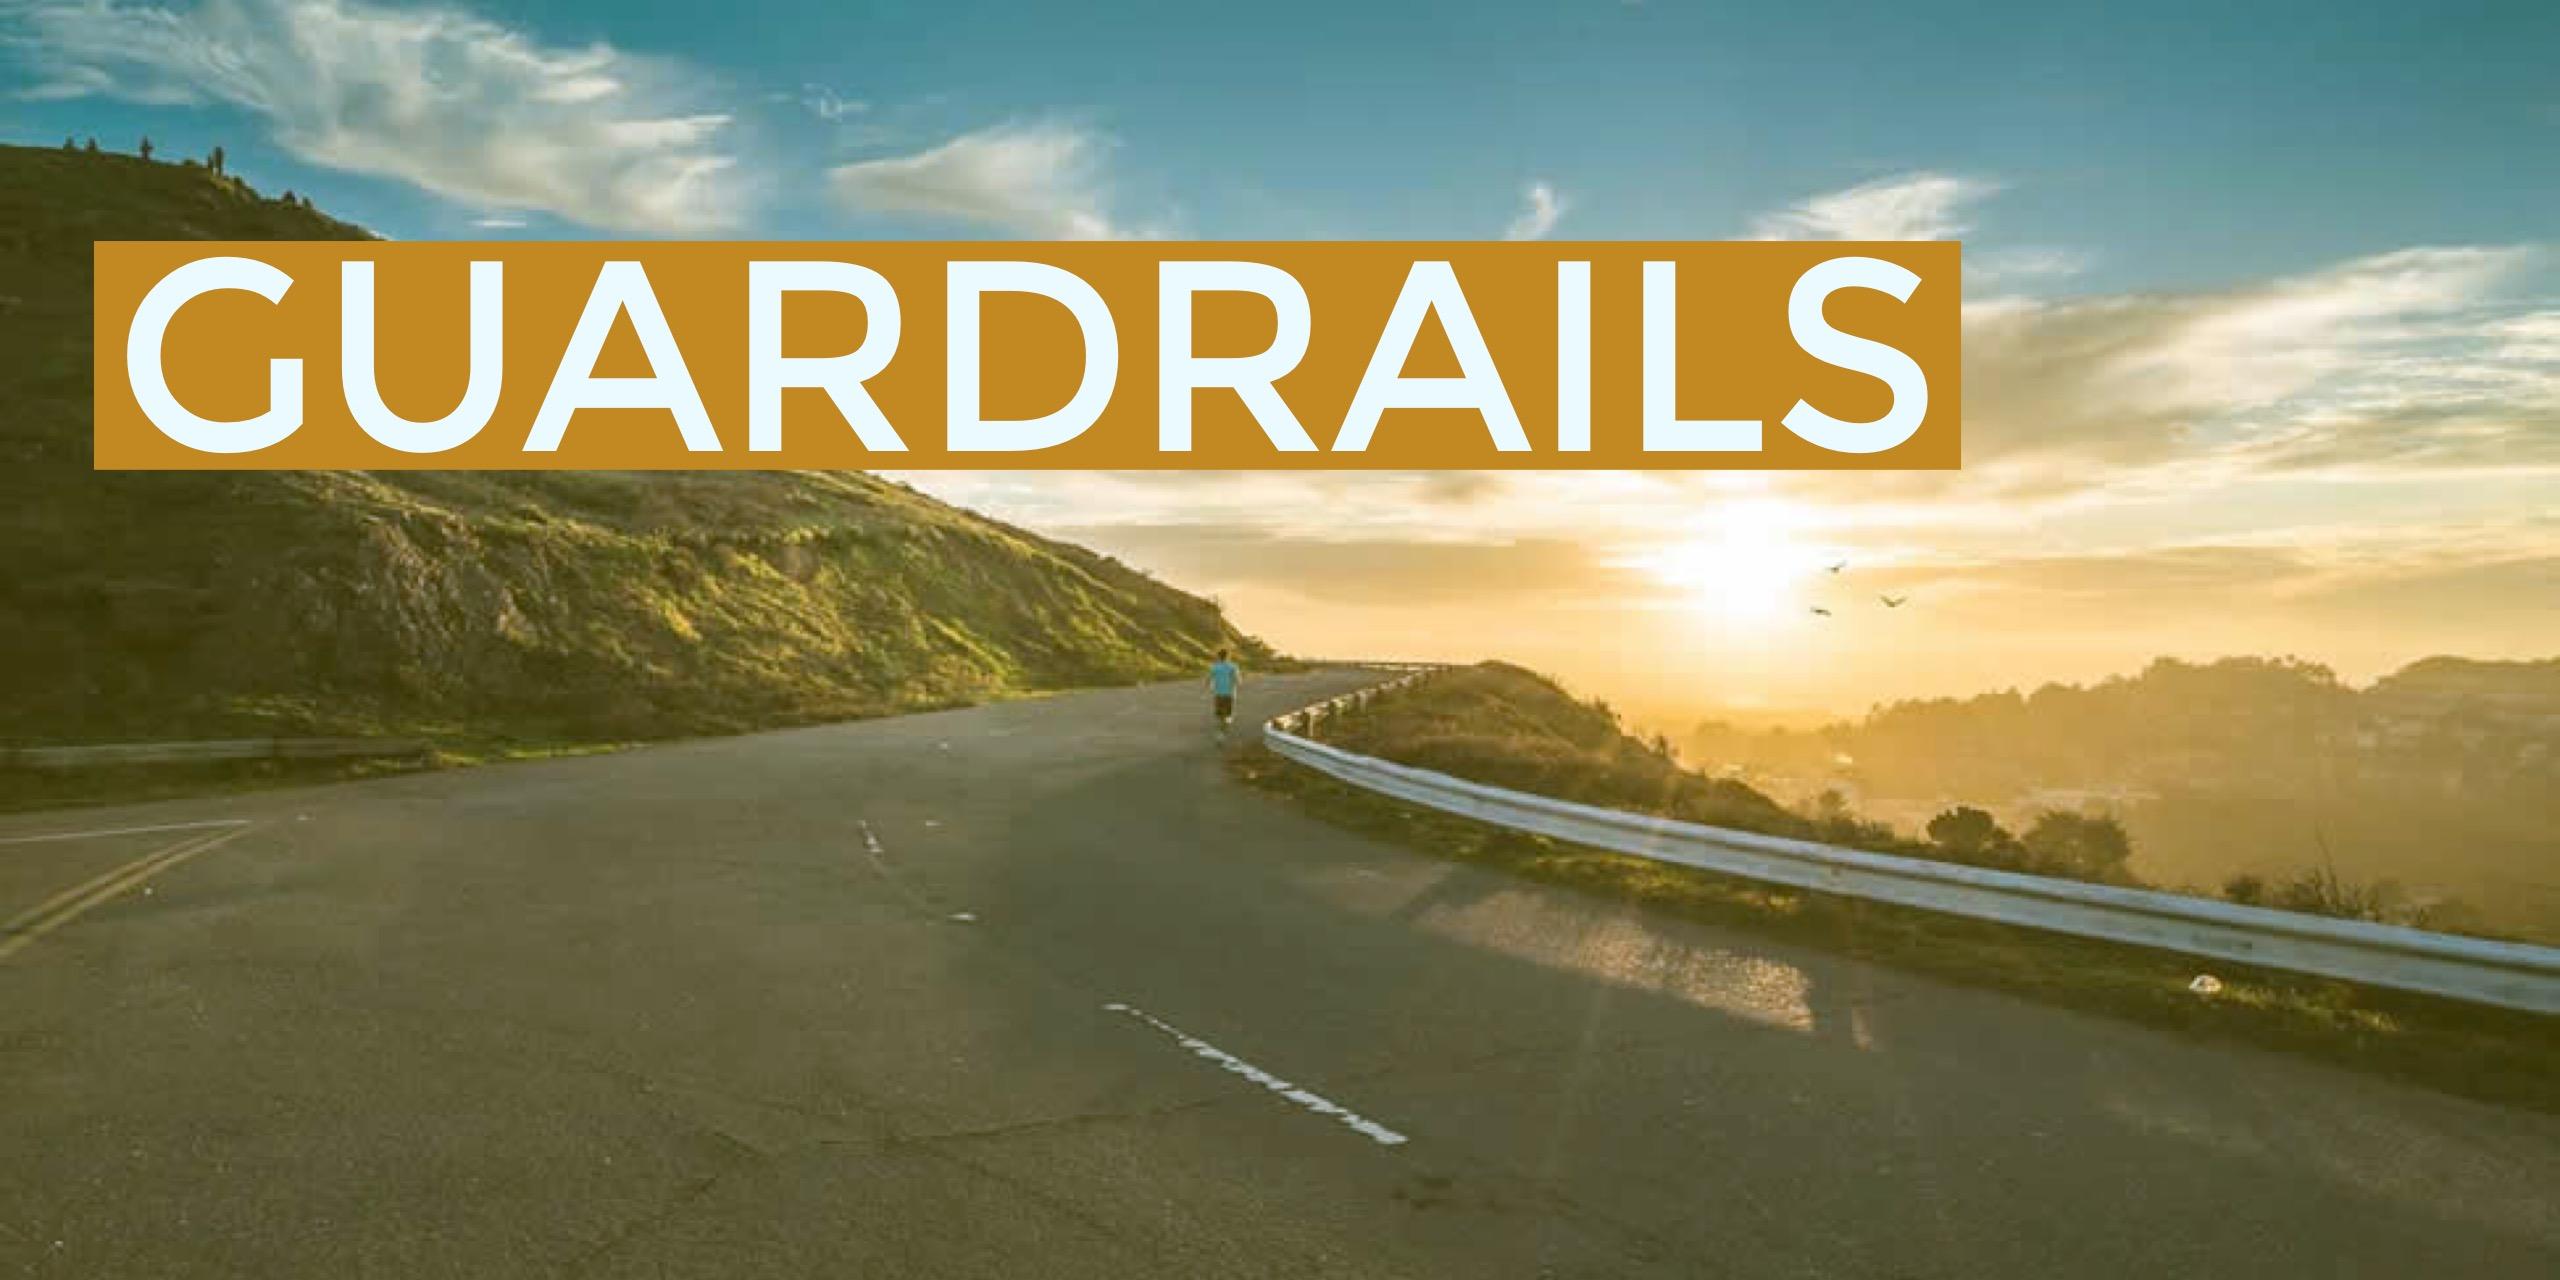 Guardrails Image